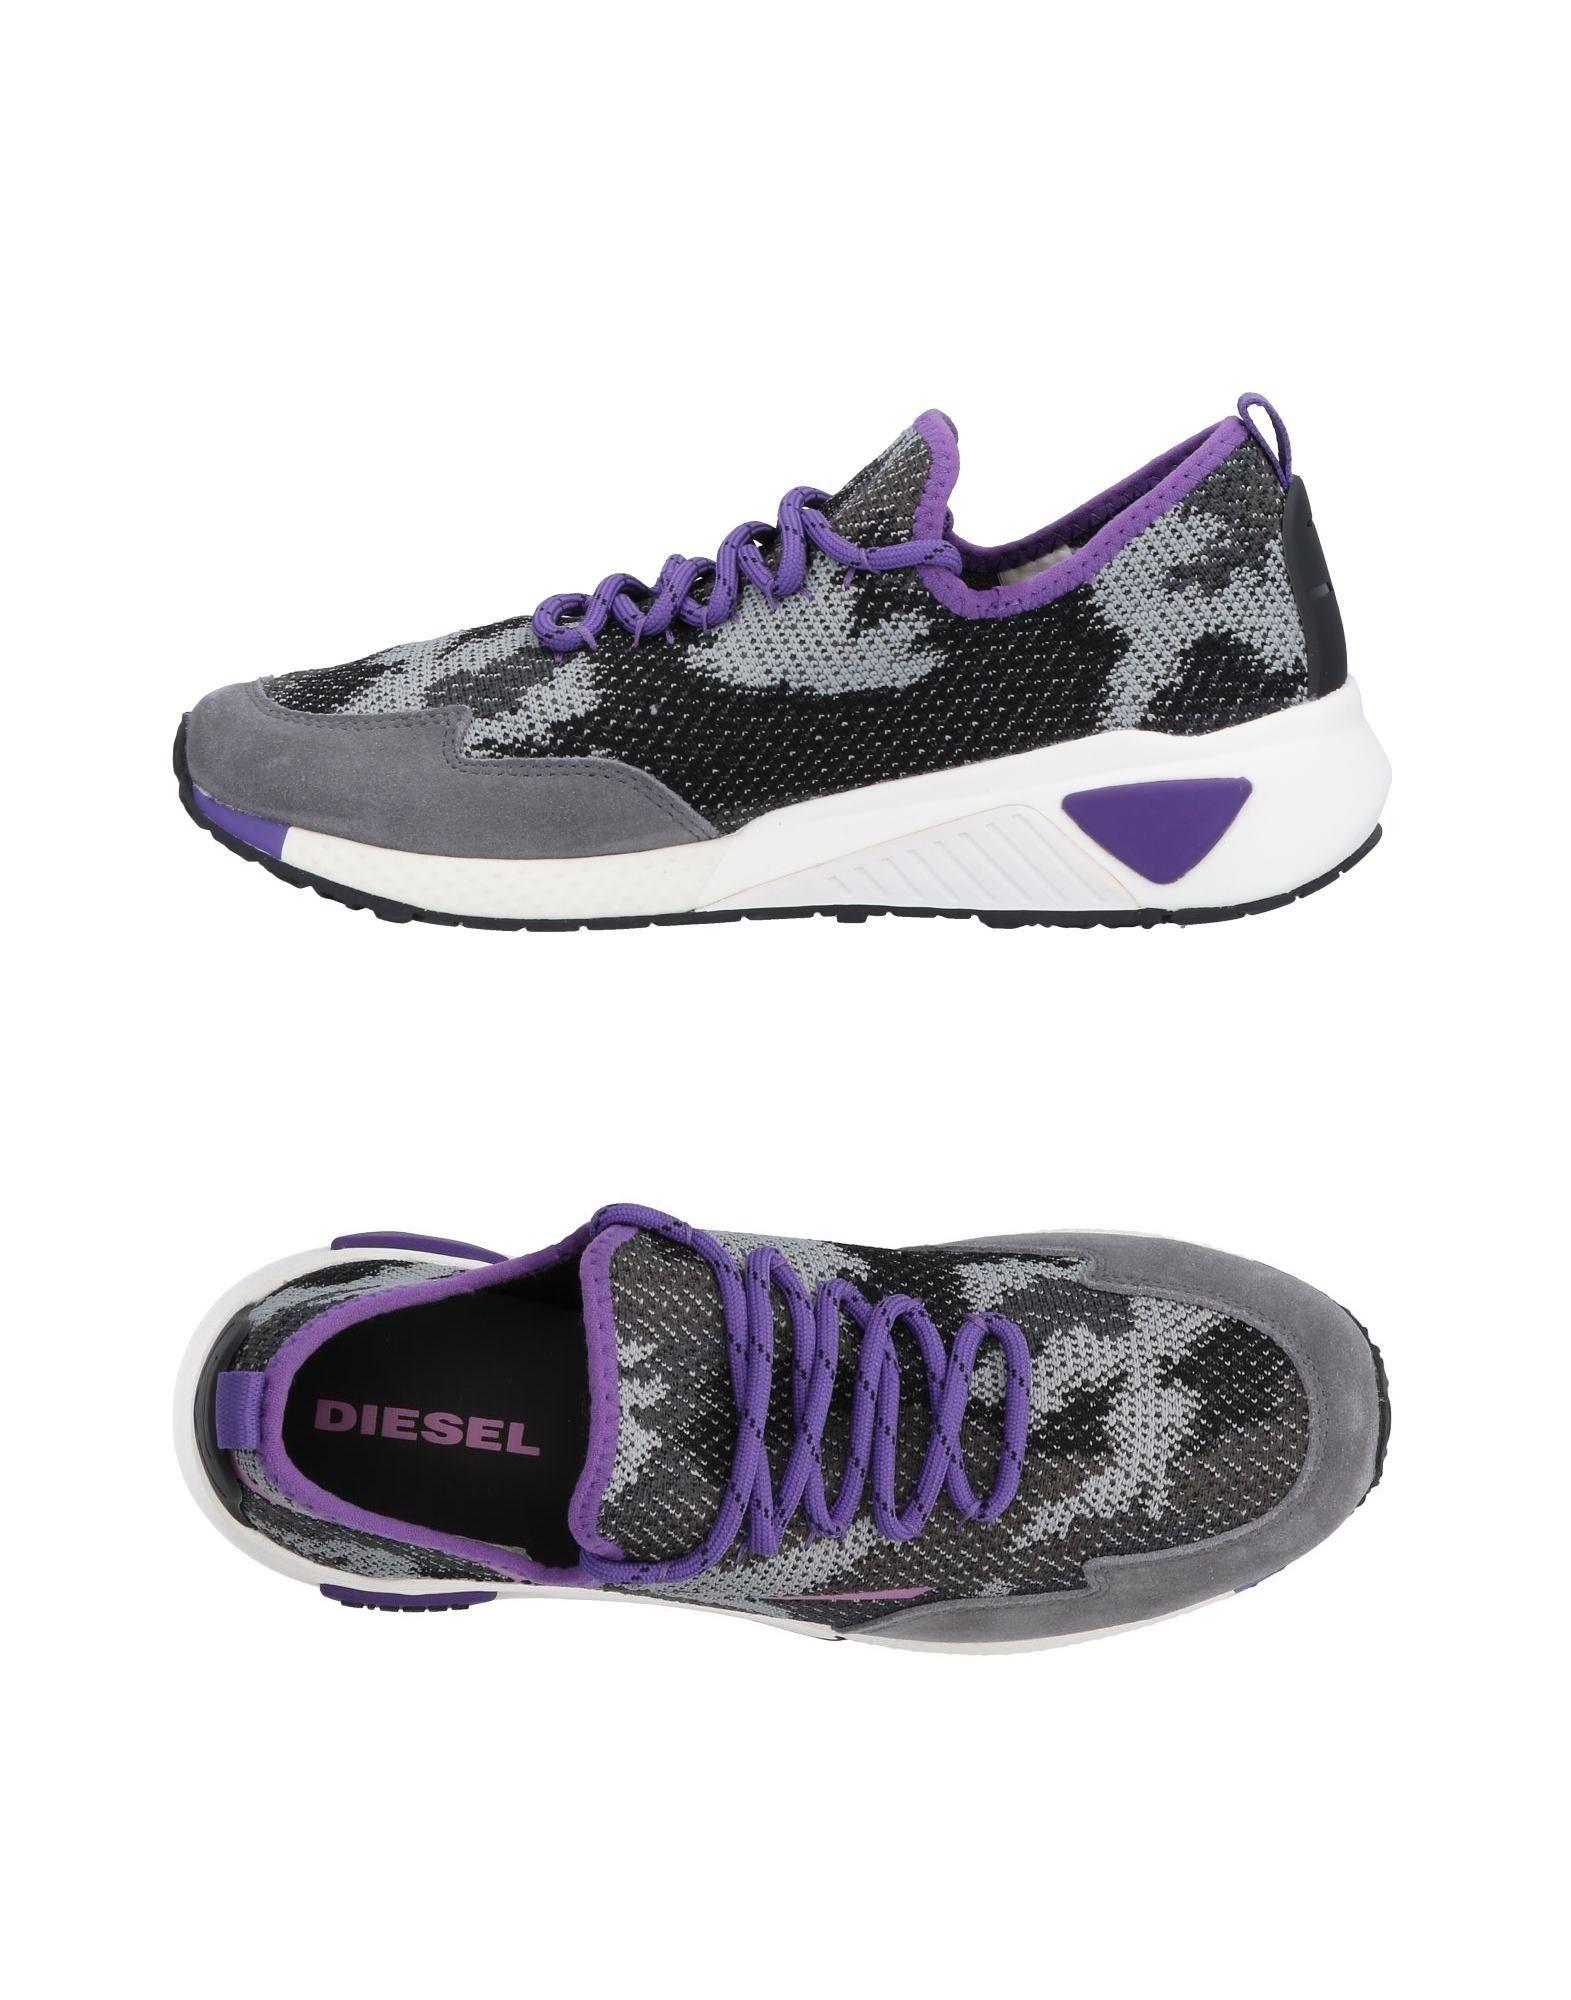 Diesel Diesel Diesel Sneakers Damen  11491250LI Gute Qualität beliebte Schuhe 571f81